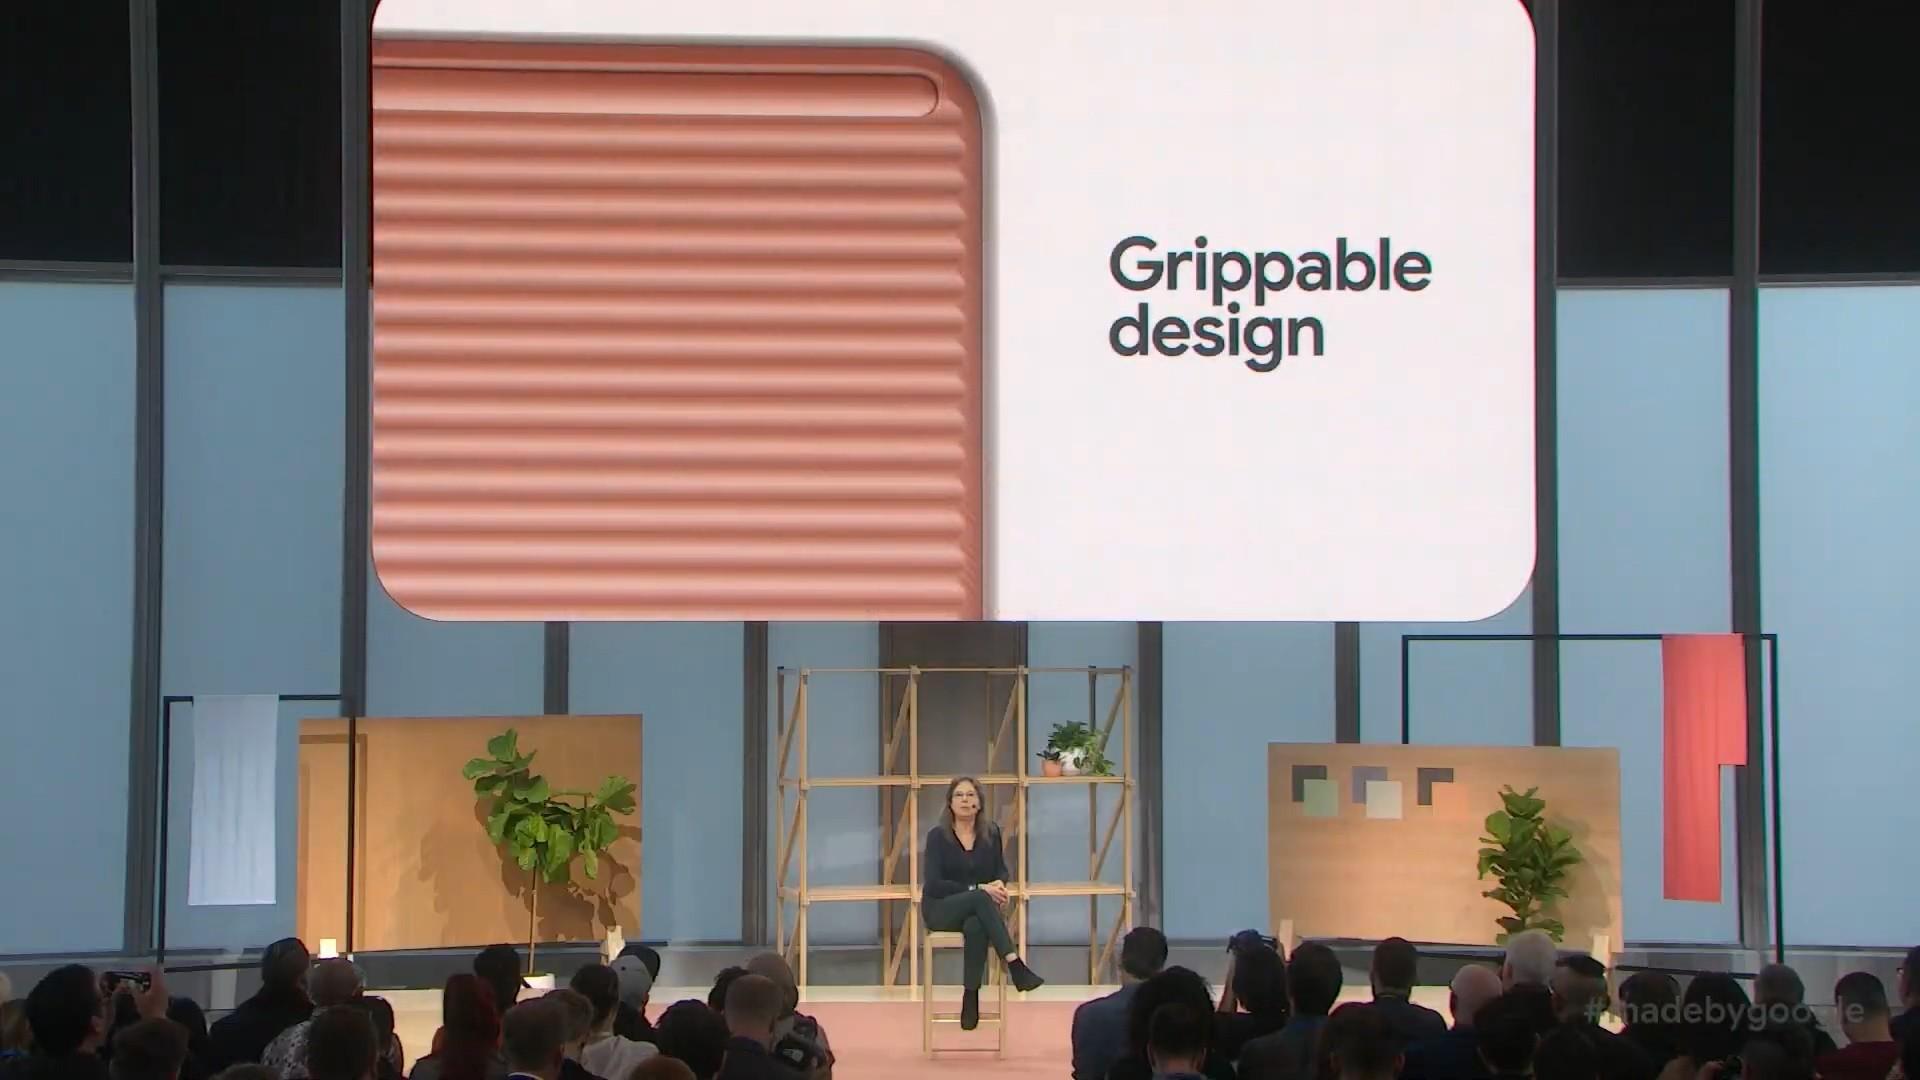 Grippable design